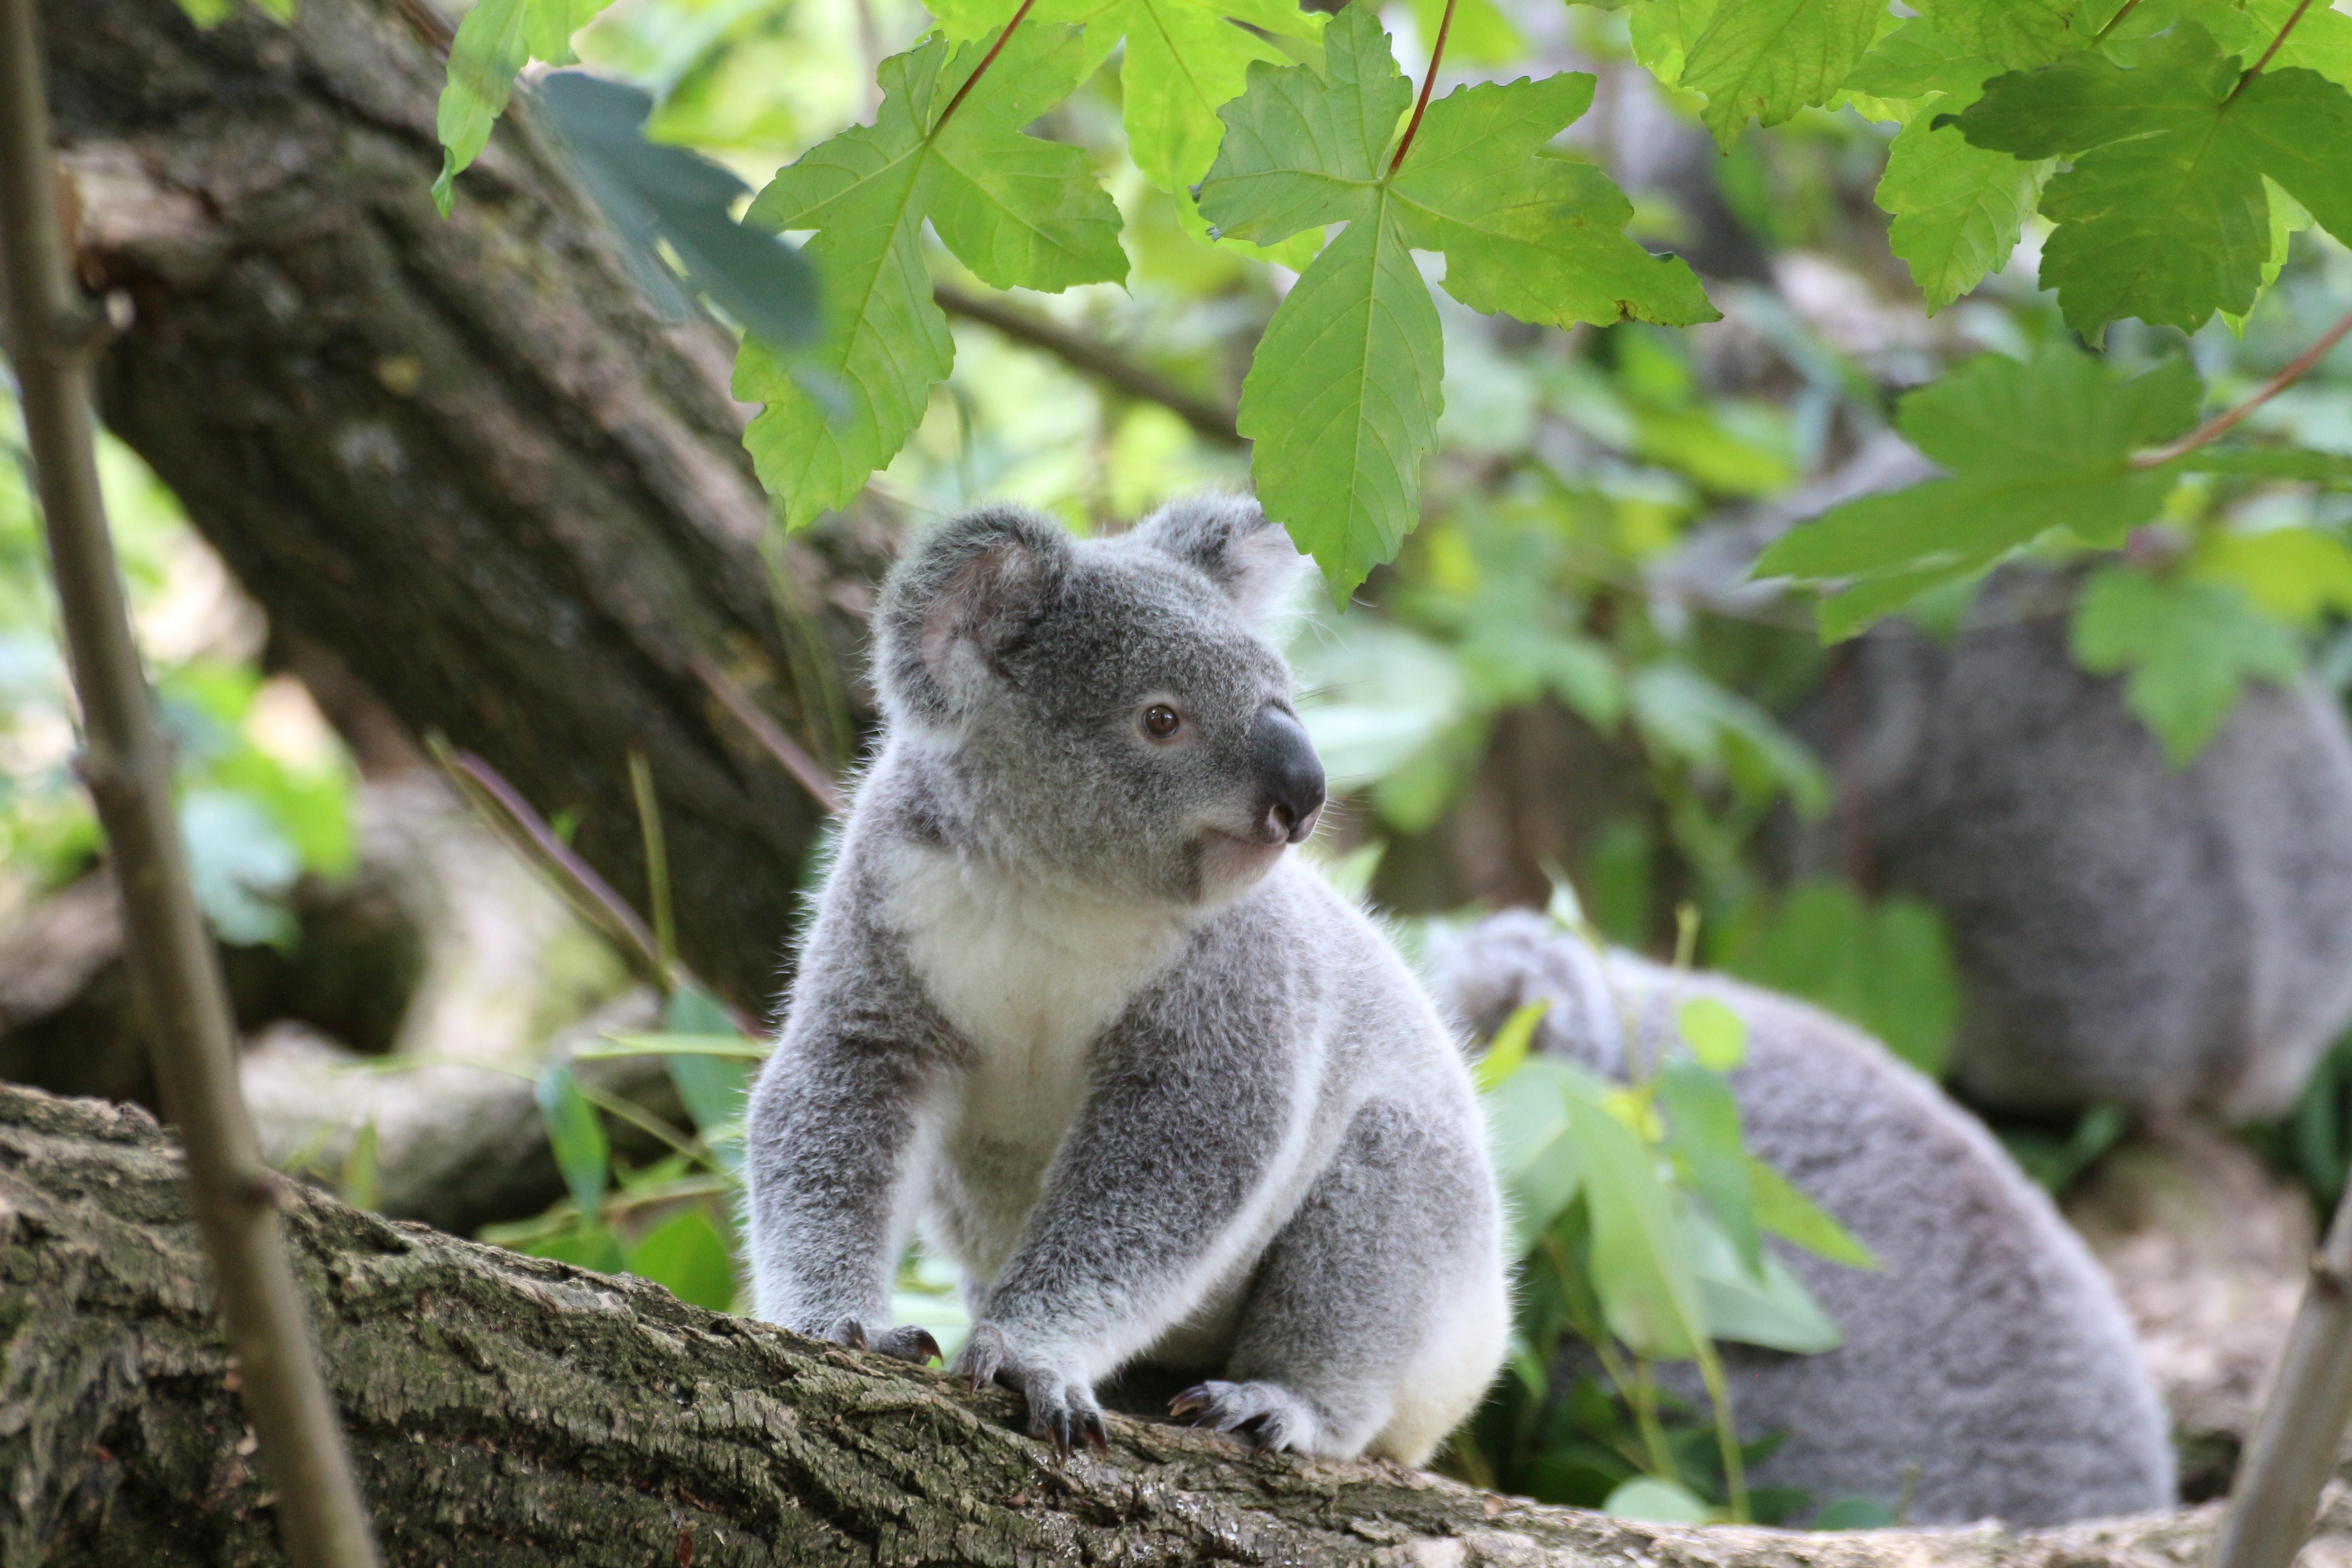 Koala bear on grey wood trunk on daytime photo